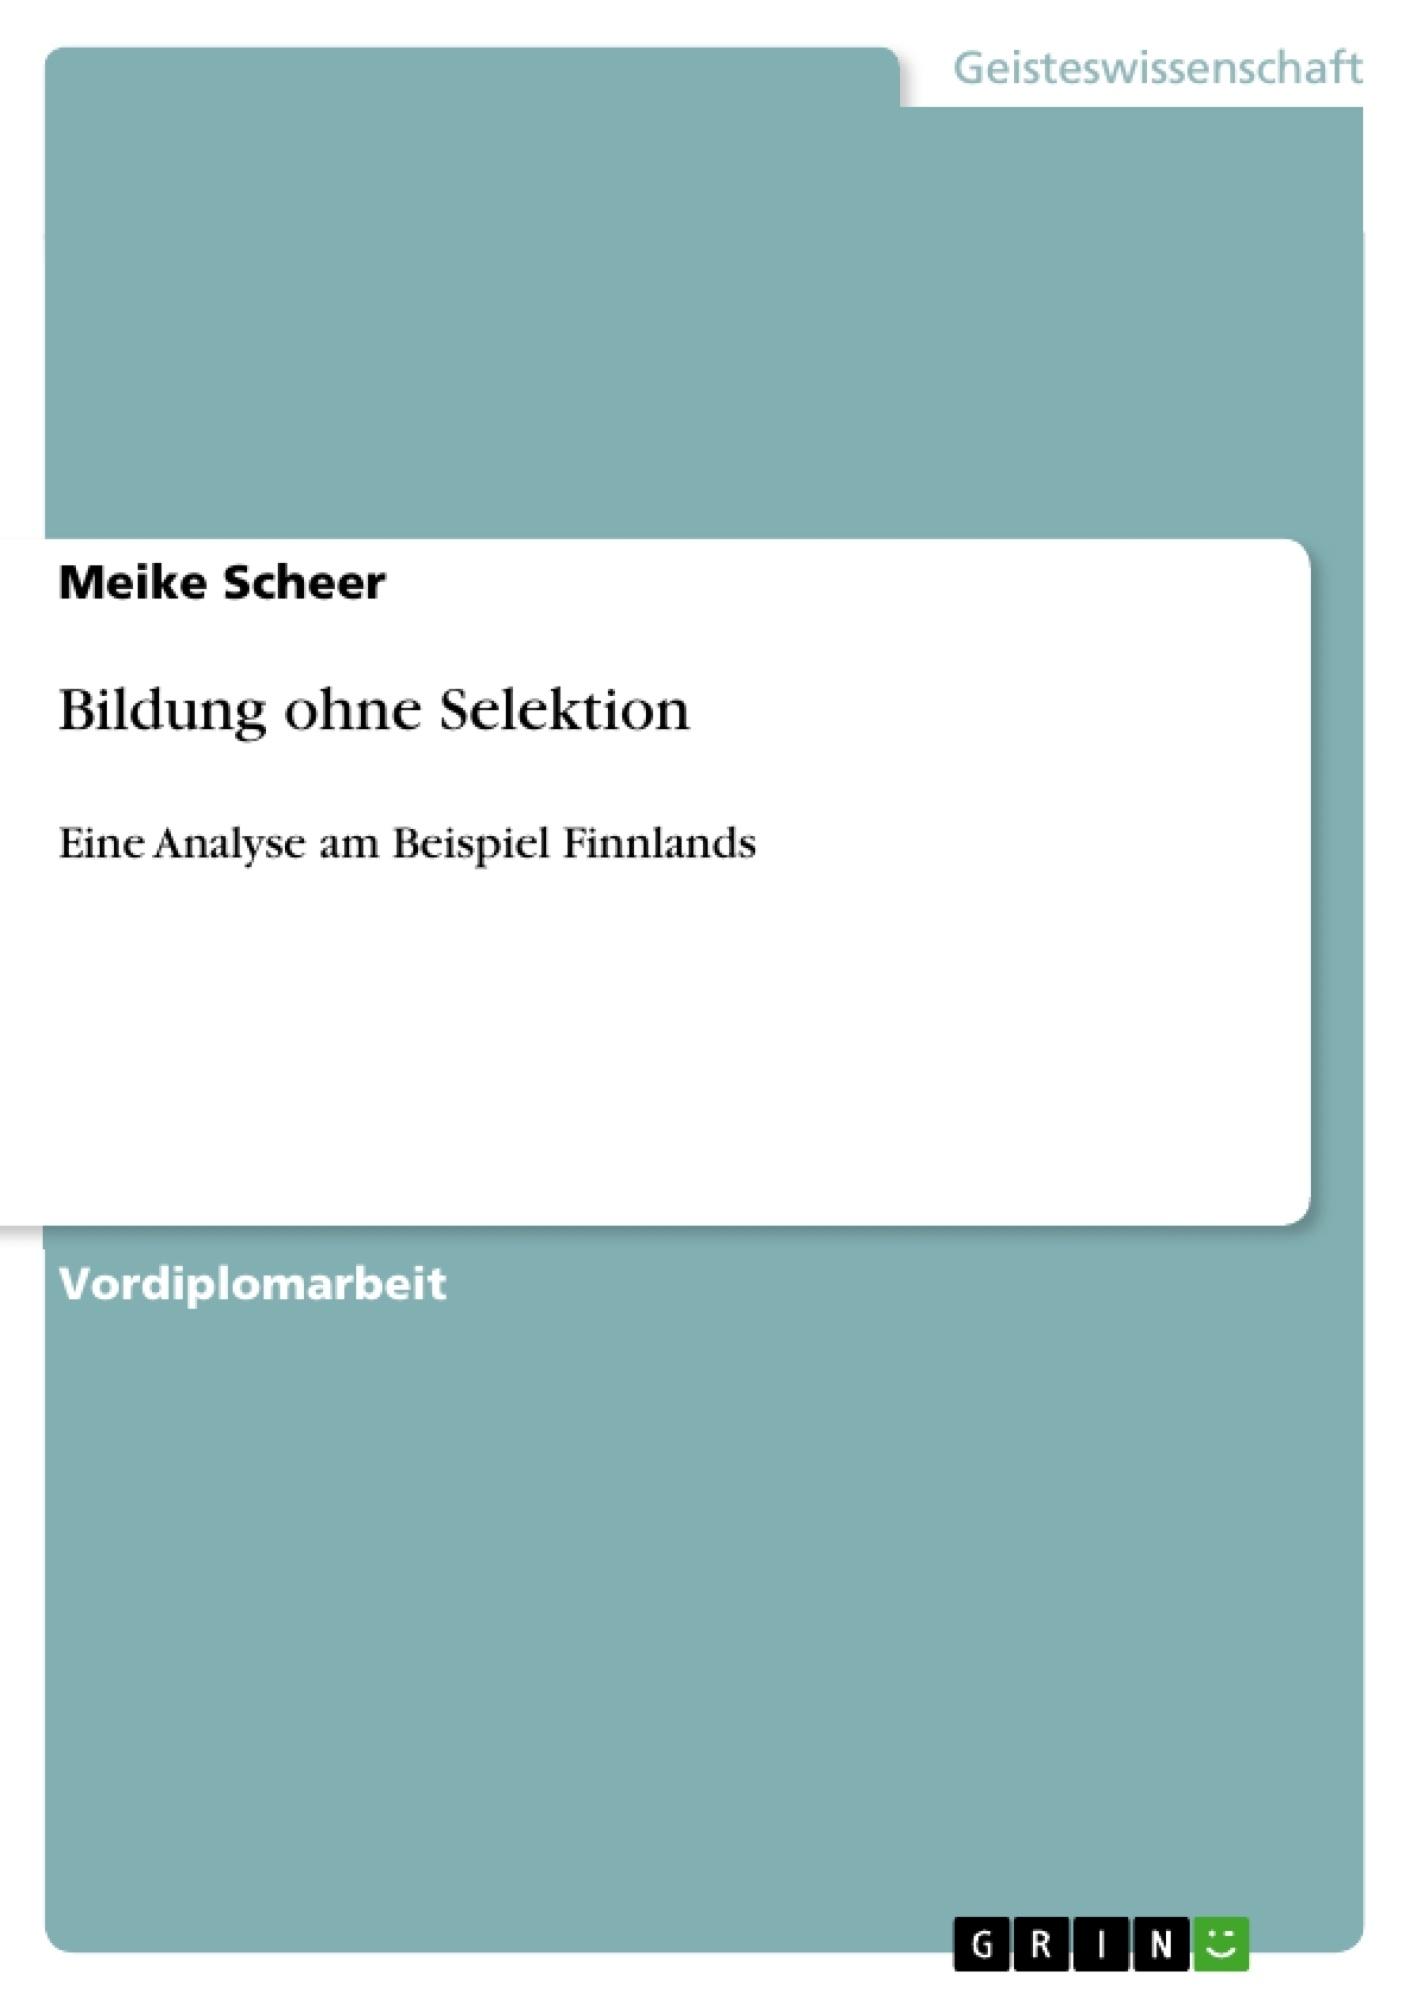 Titel: Bildung ohne Selektion